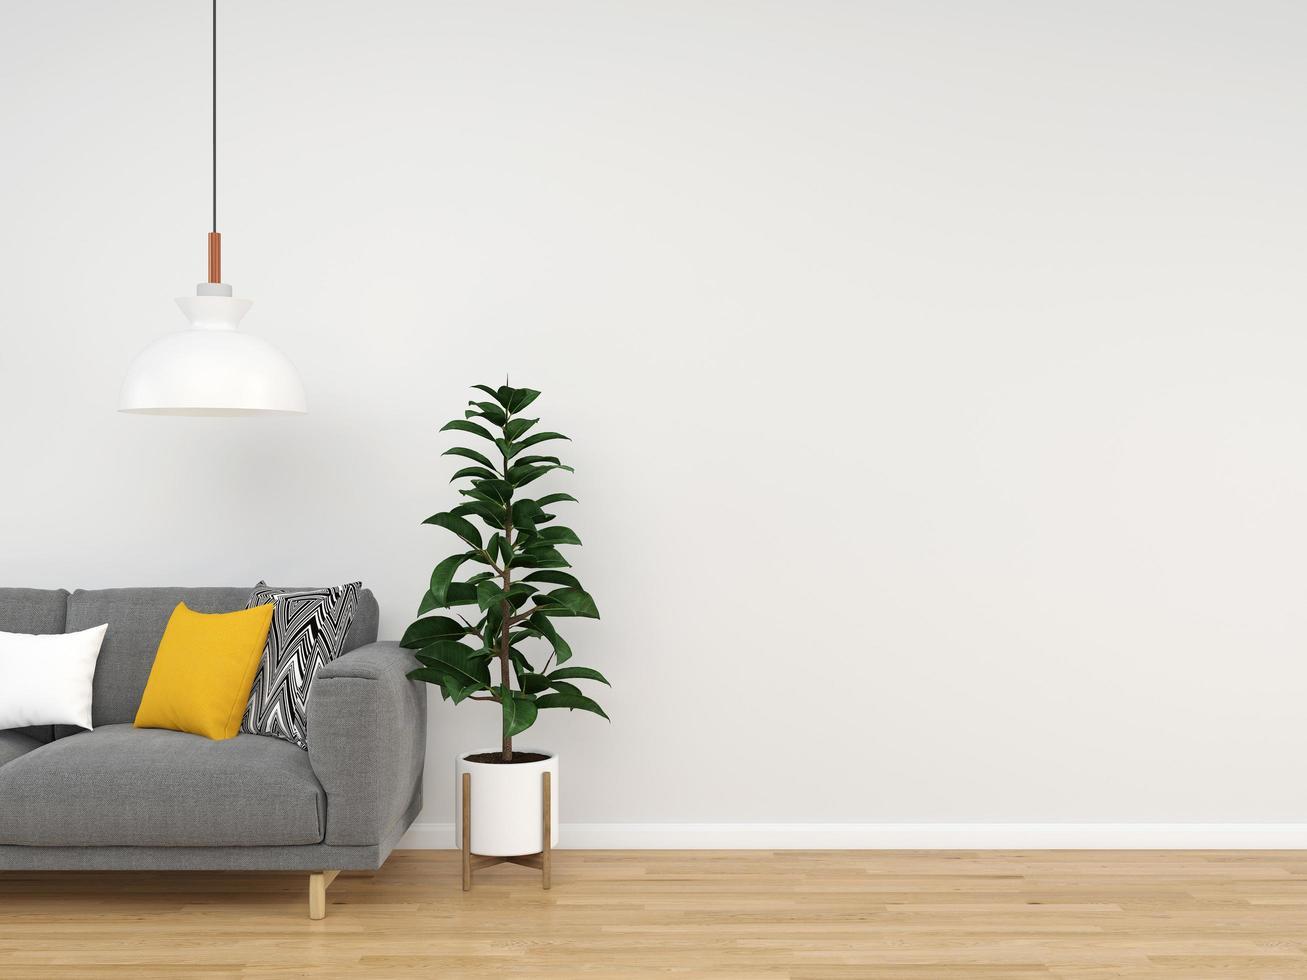 sala de estar 3d renderizado fondo foto